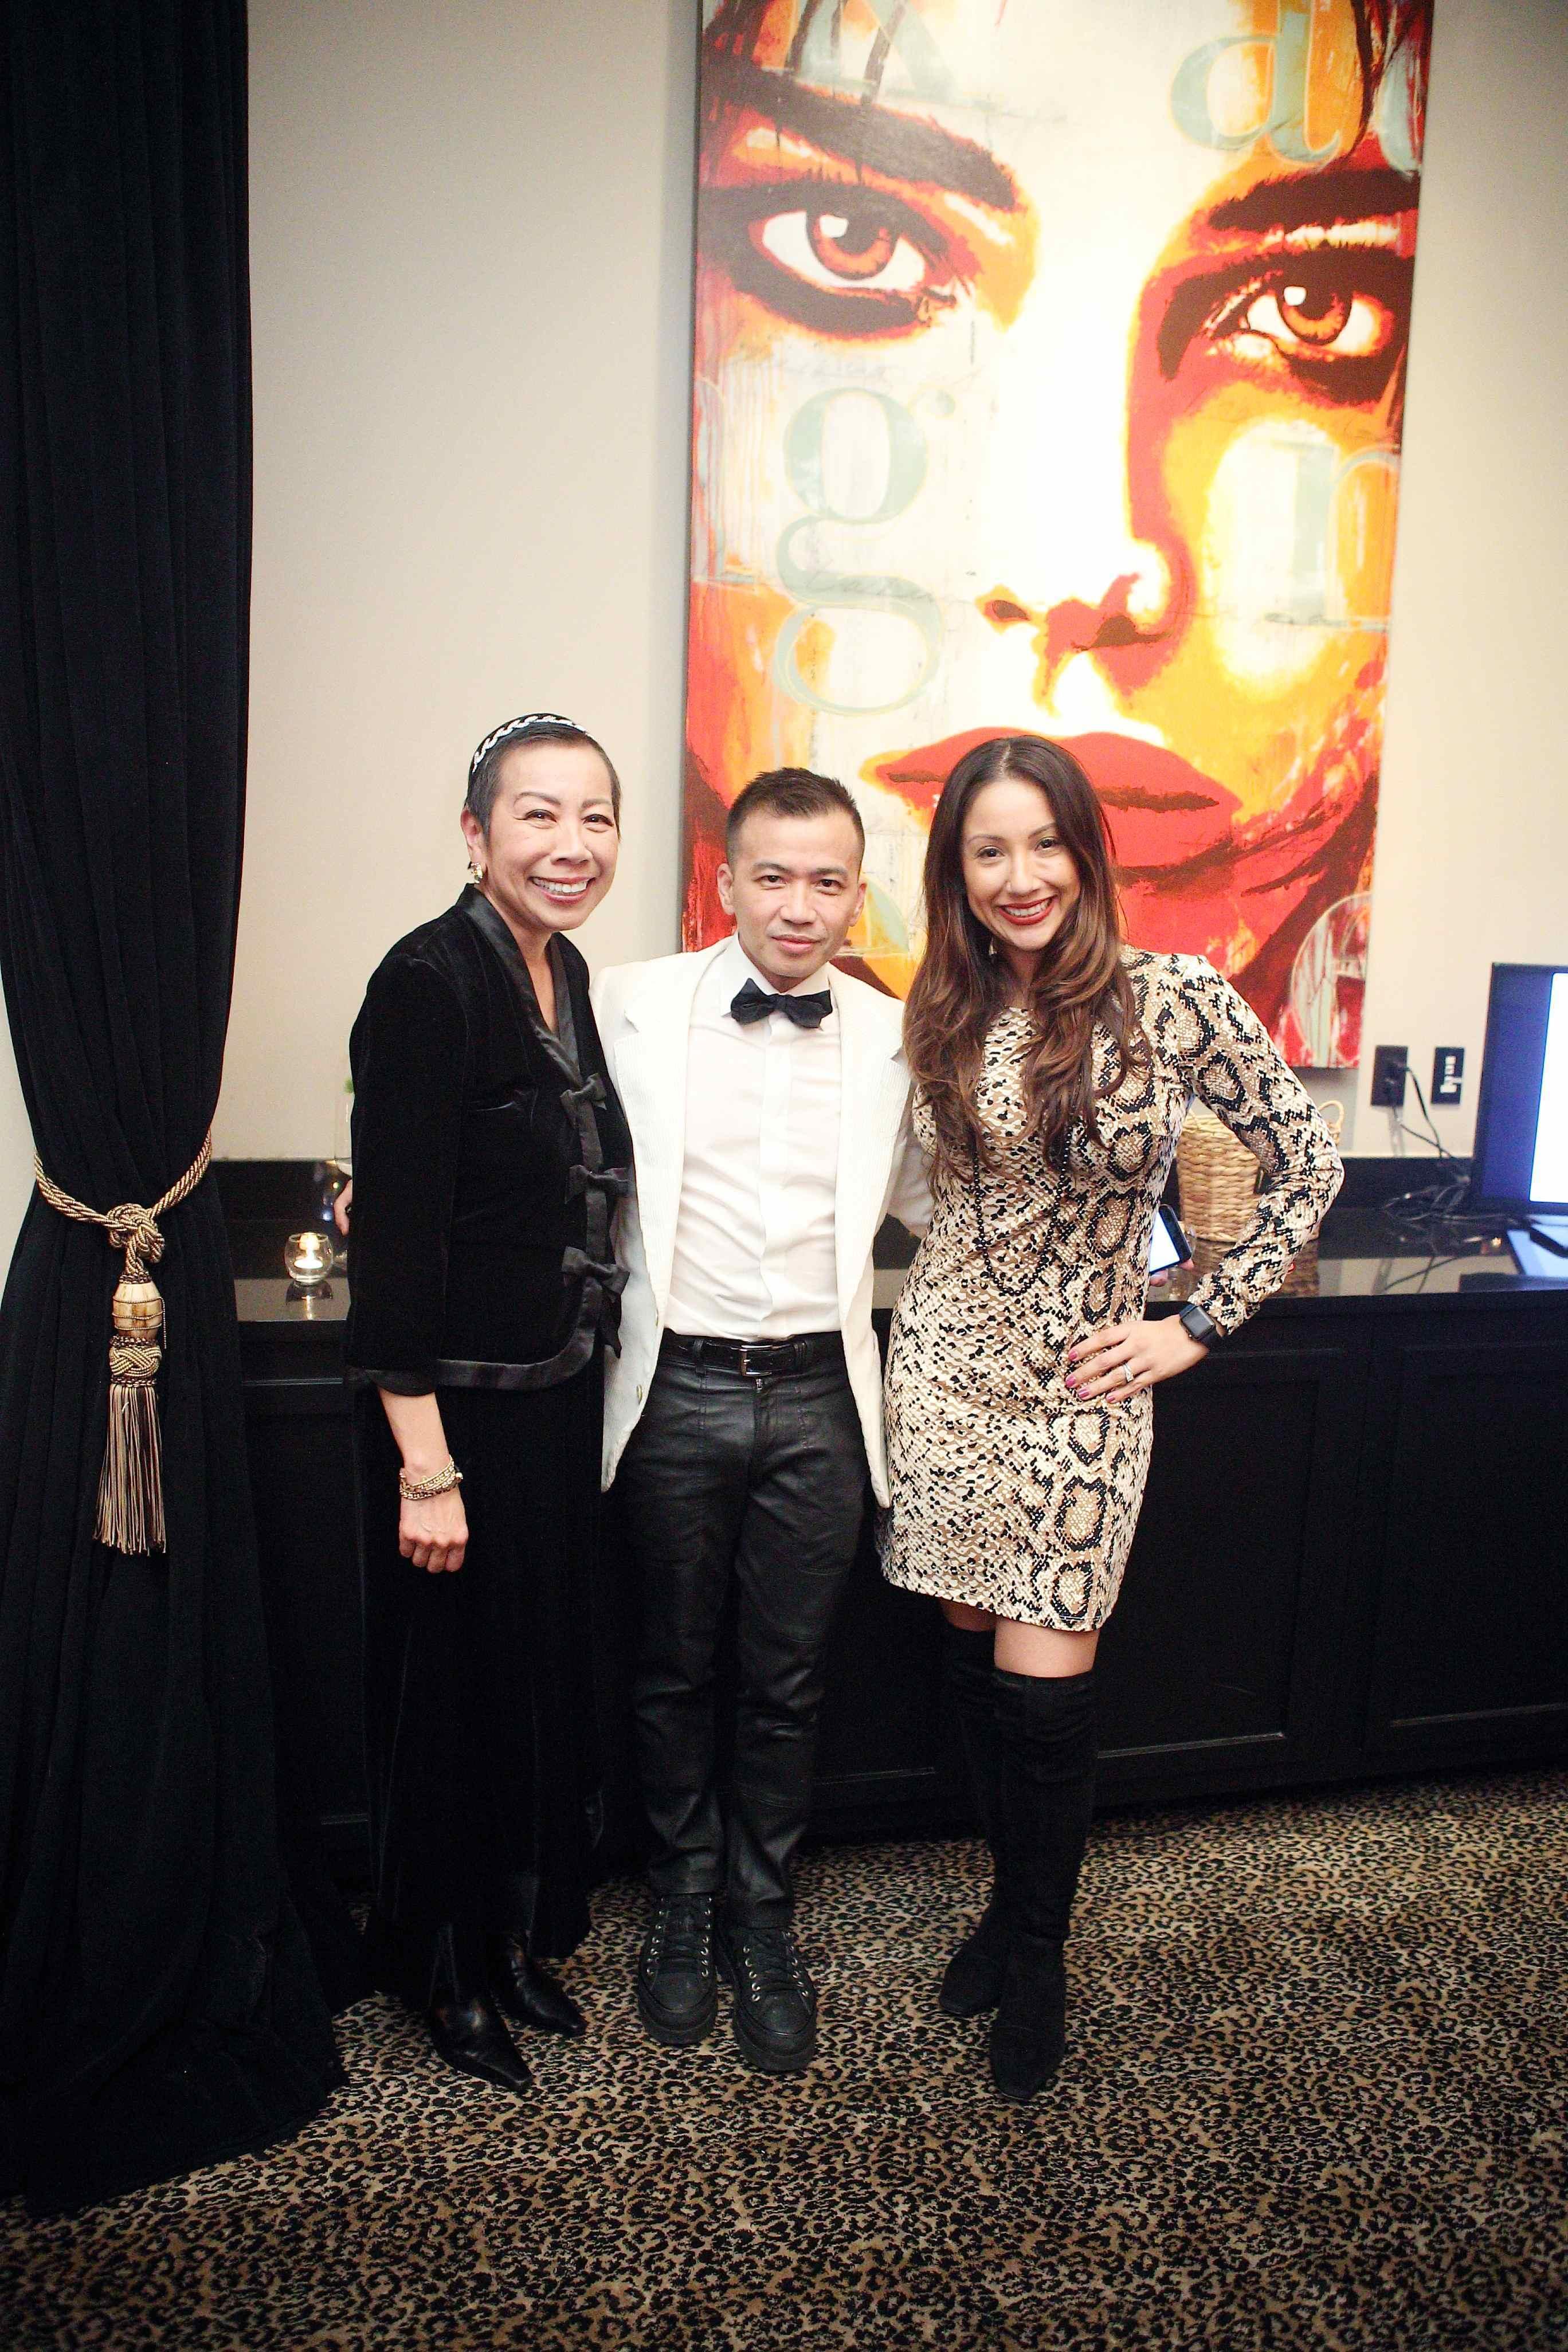 Jean Wilson, Viet Hoang, Nancy Almodovar